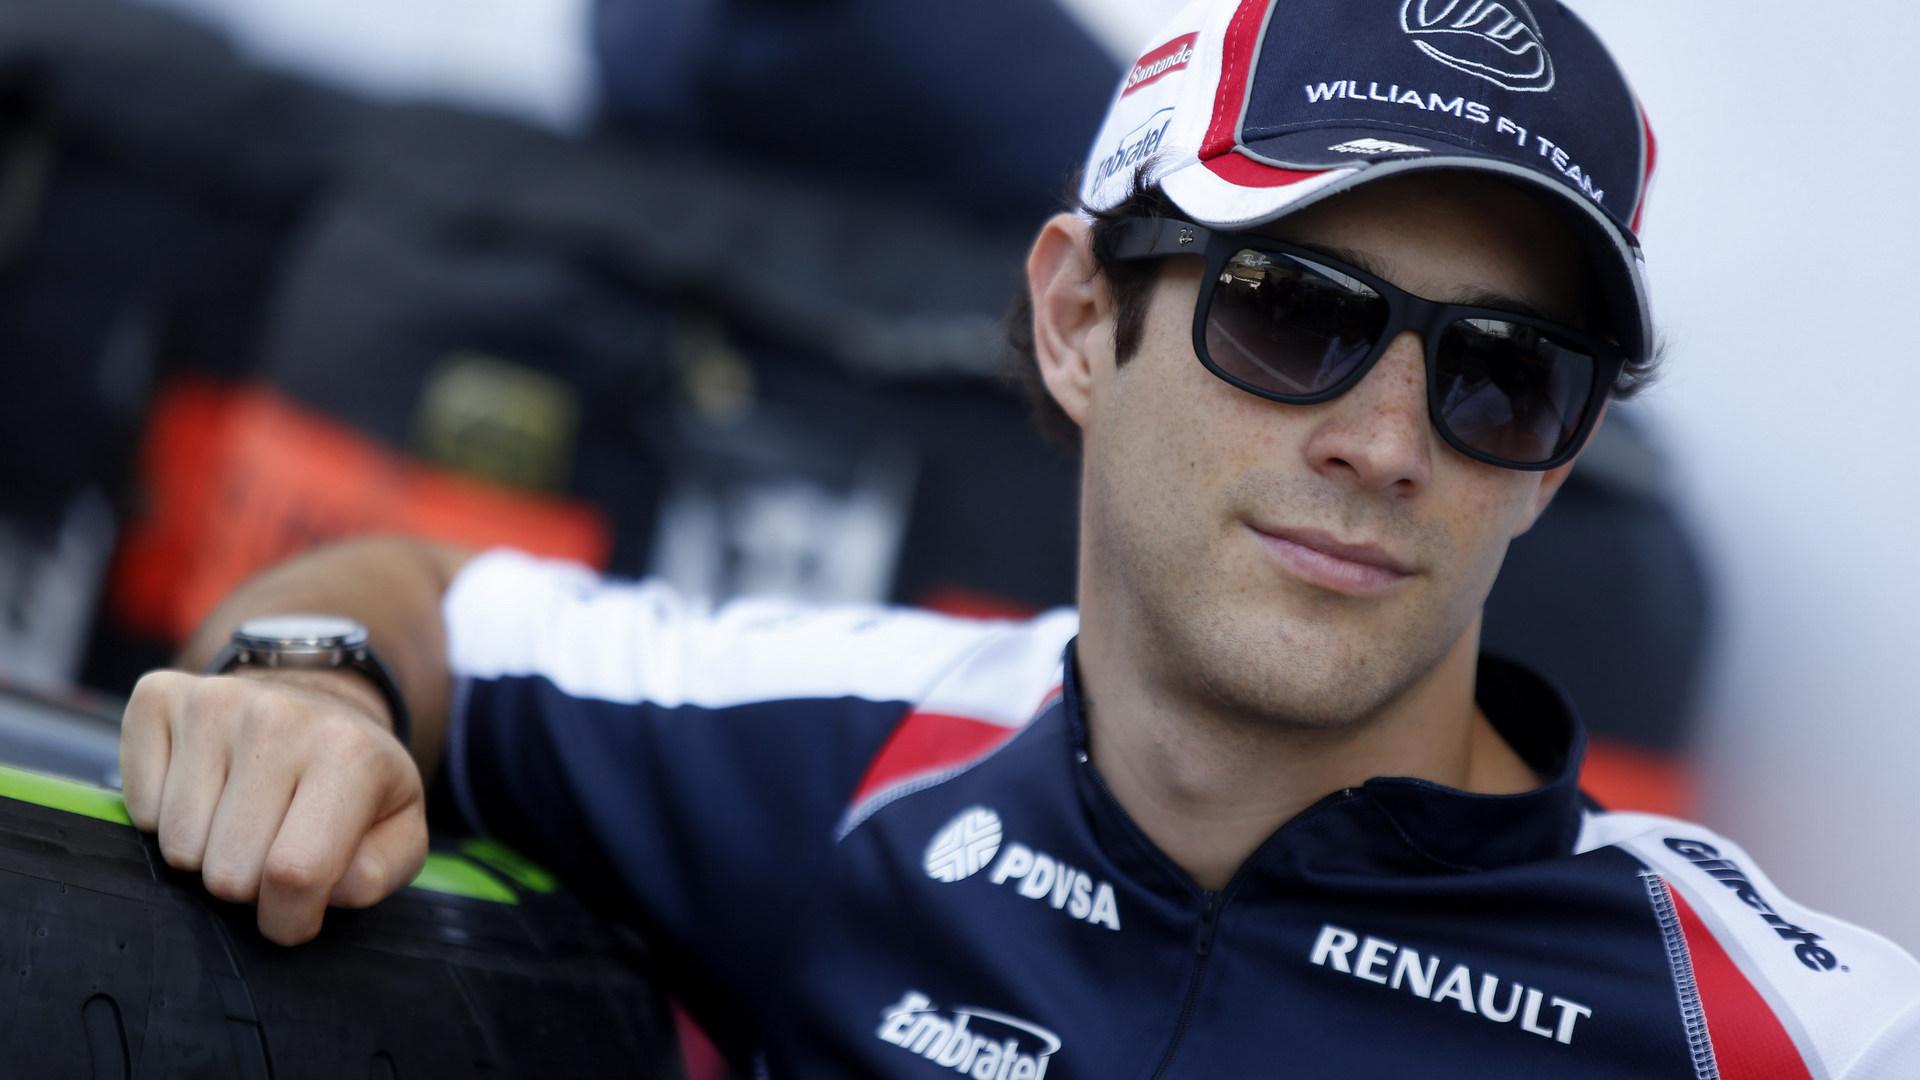 HD Wallpapers 2012 Formula 1 Grand Prix Of Brazil